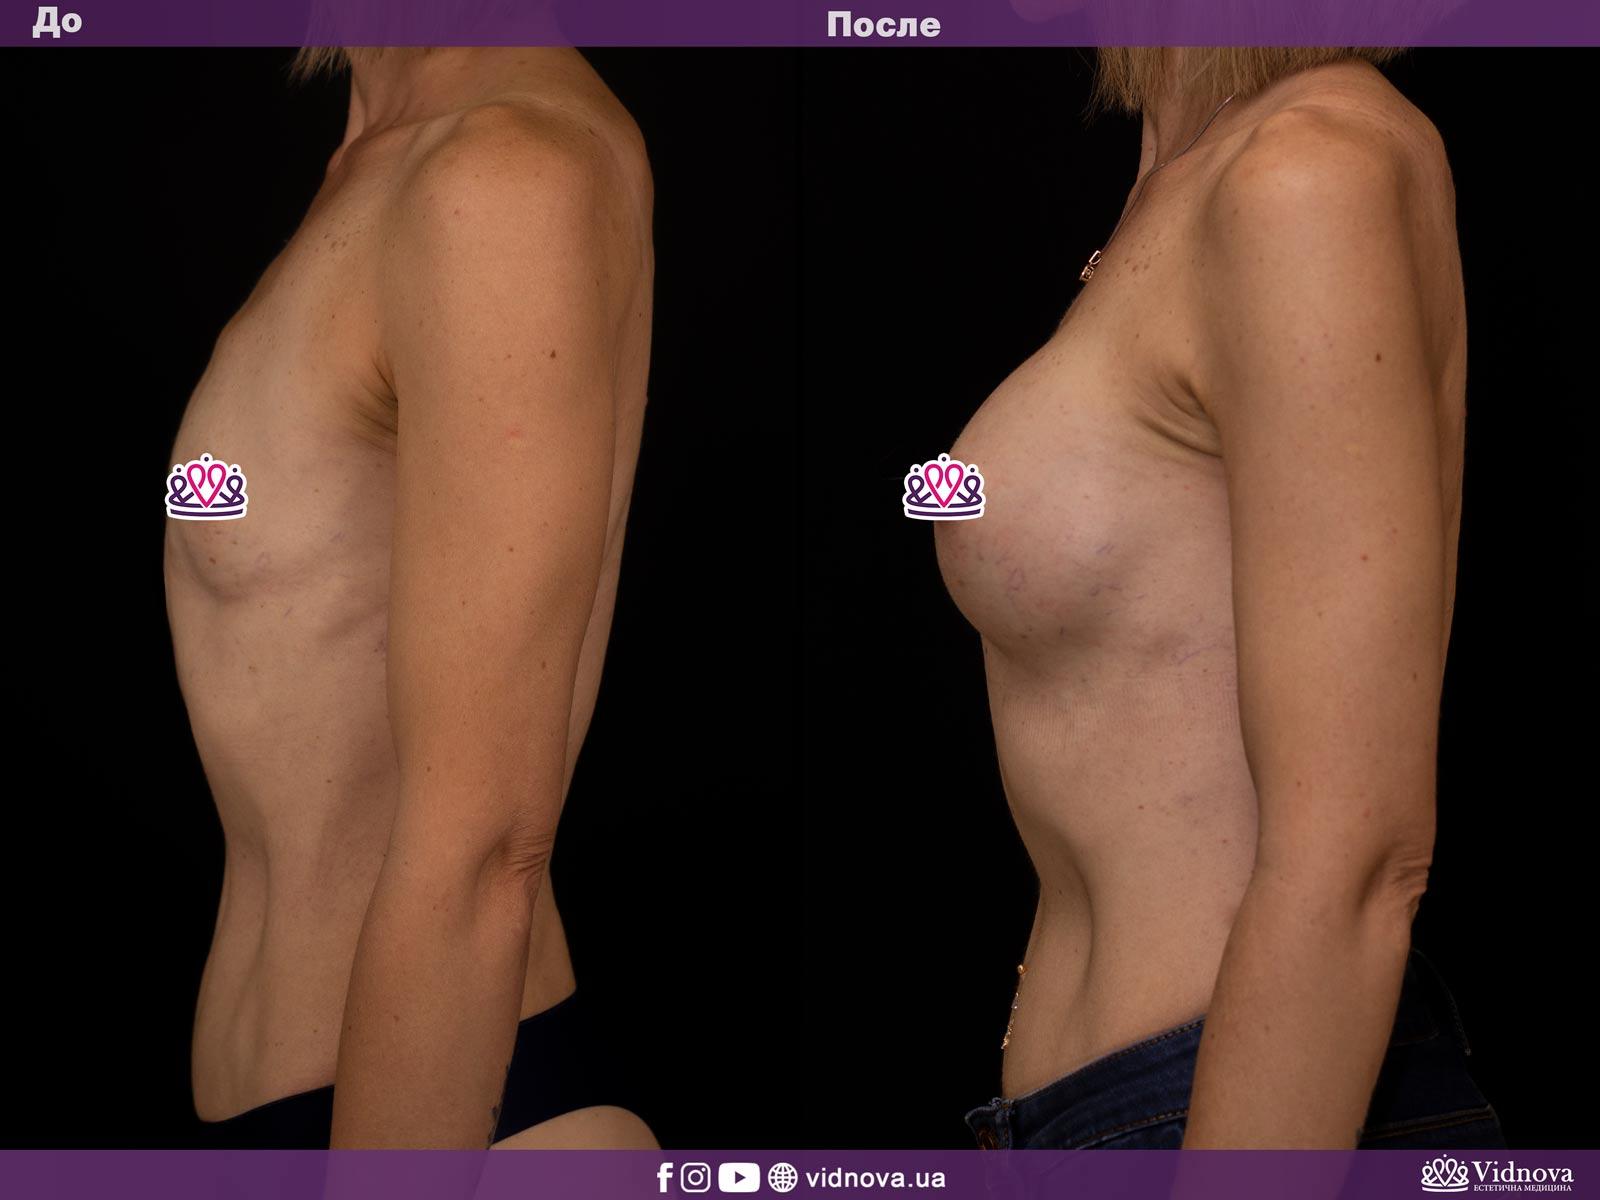 Увеличение груди: Фото ДО и ПОСЛЕ - Пример №14-3 - Клиника Vidnova